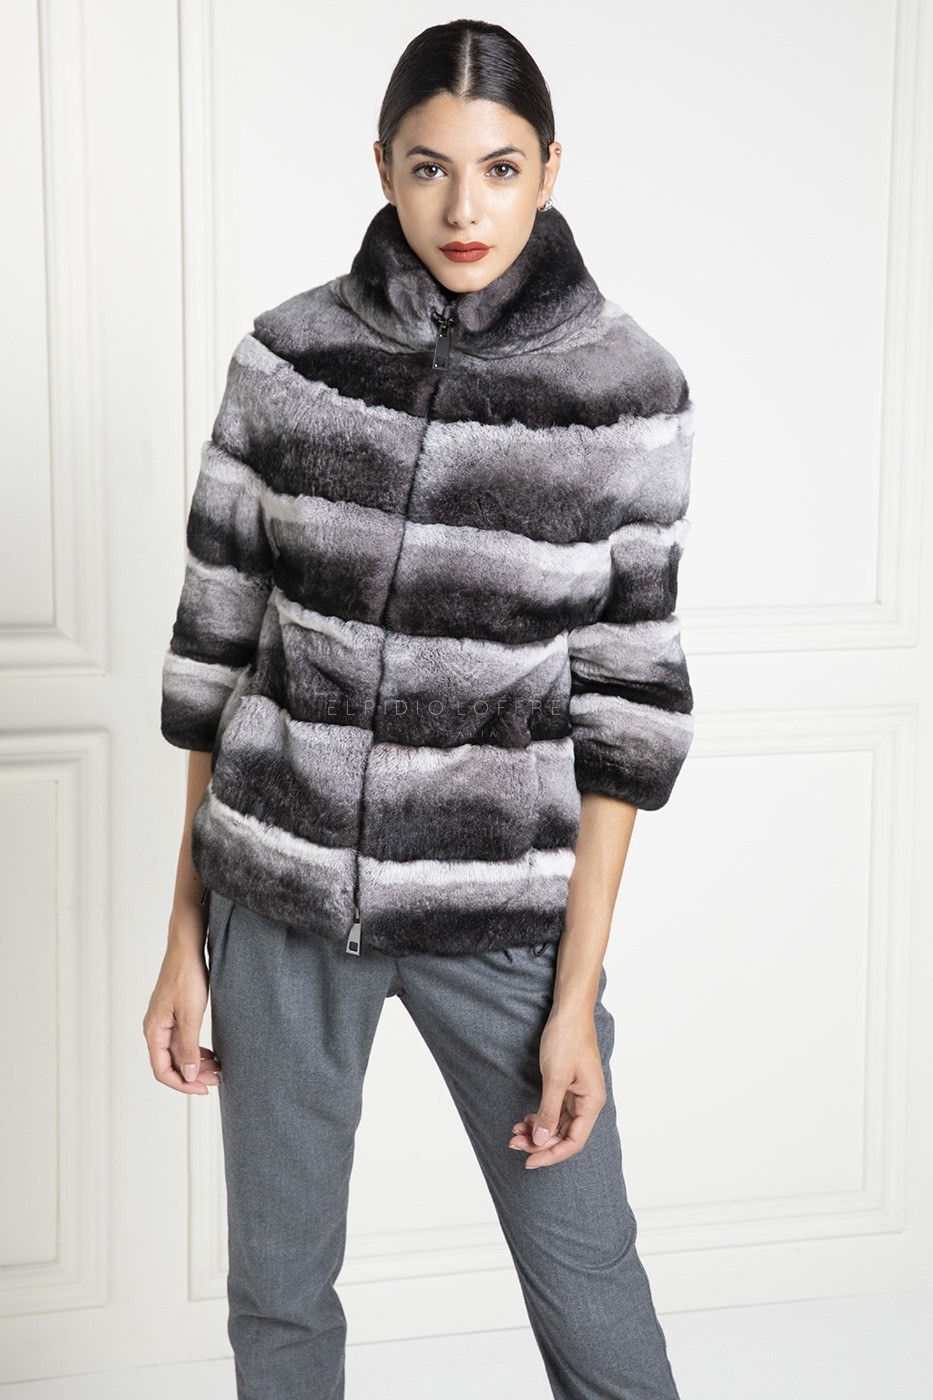 Orylag Fur Jacket - Length 65 cm